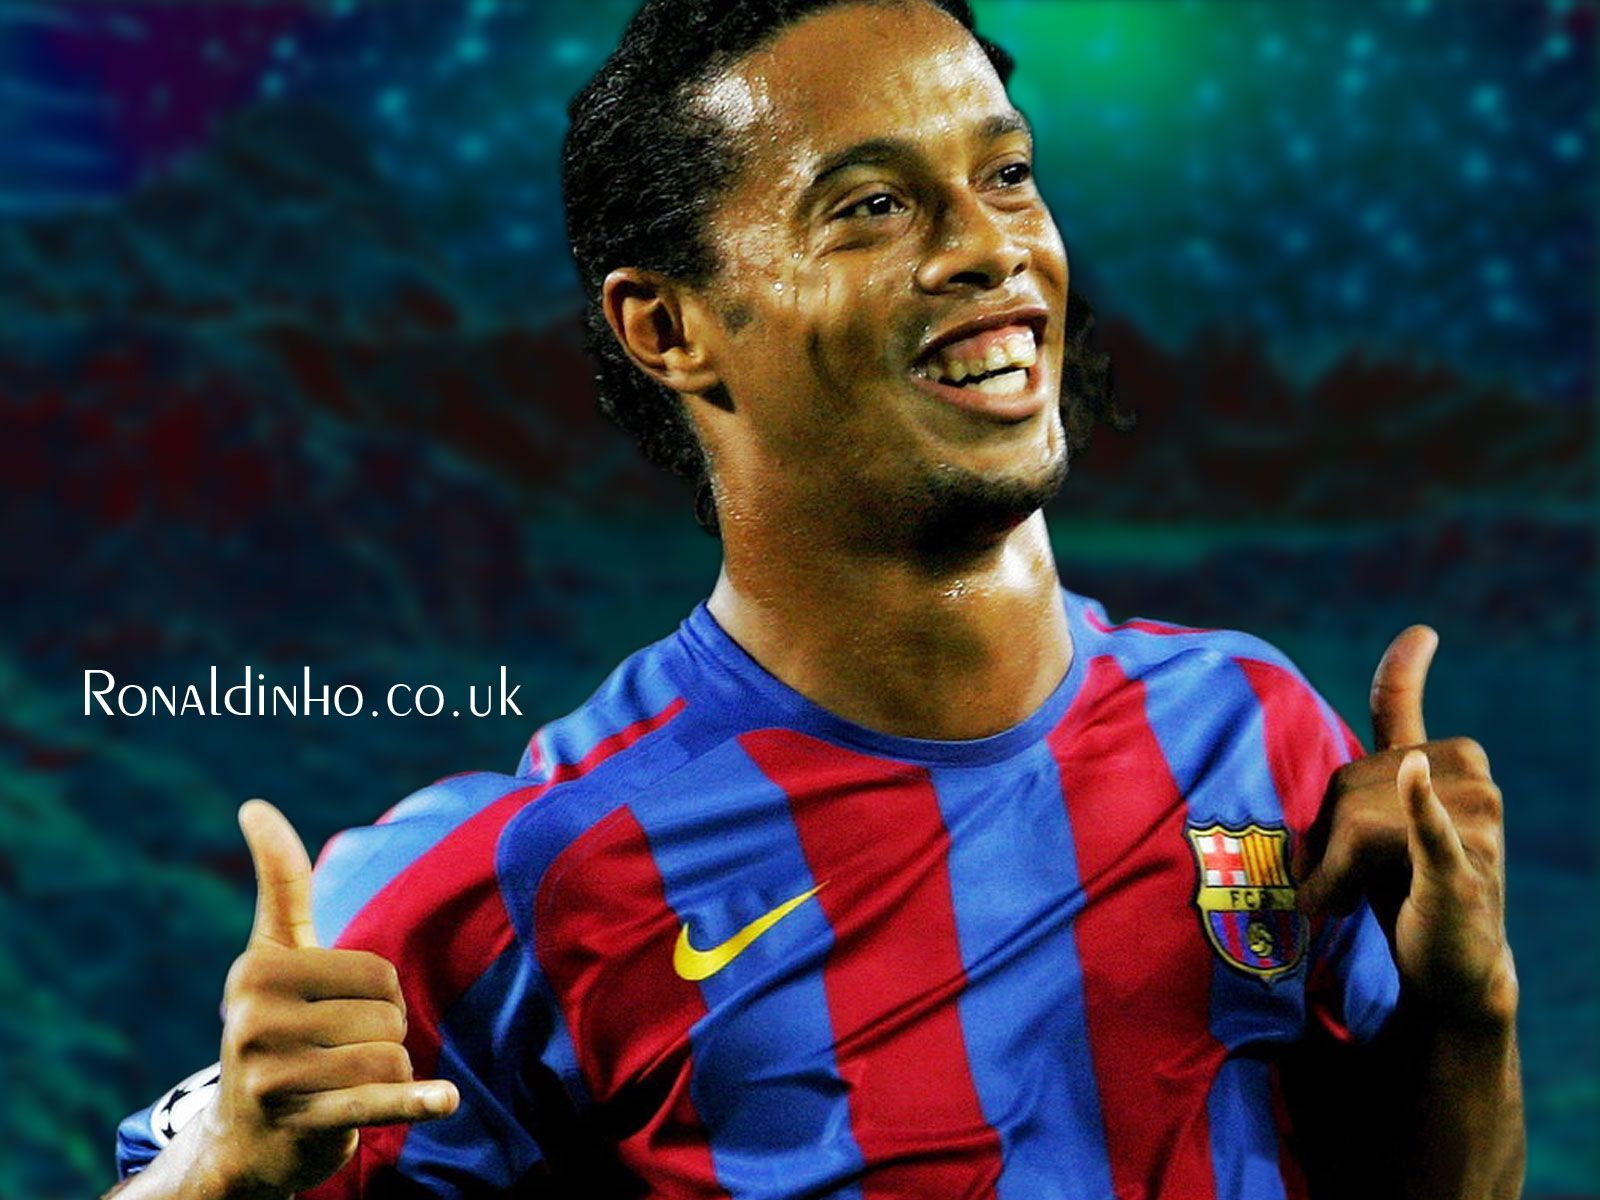 Ben Barclay Wallpaper: Ronaldinho Wallpapers